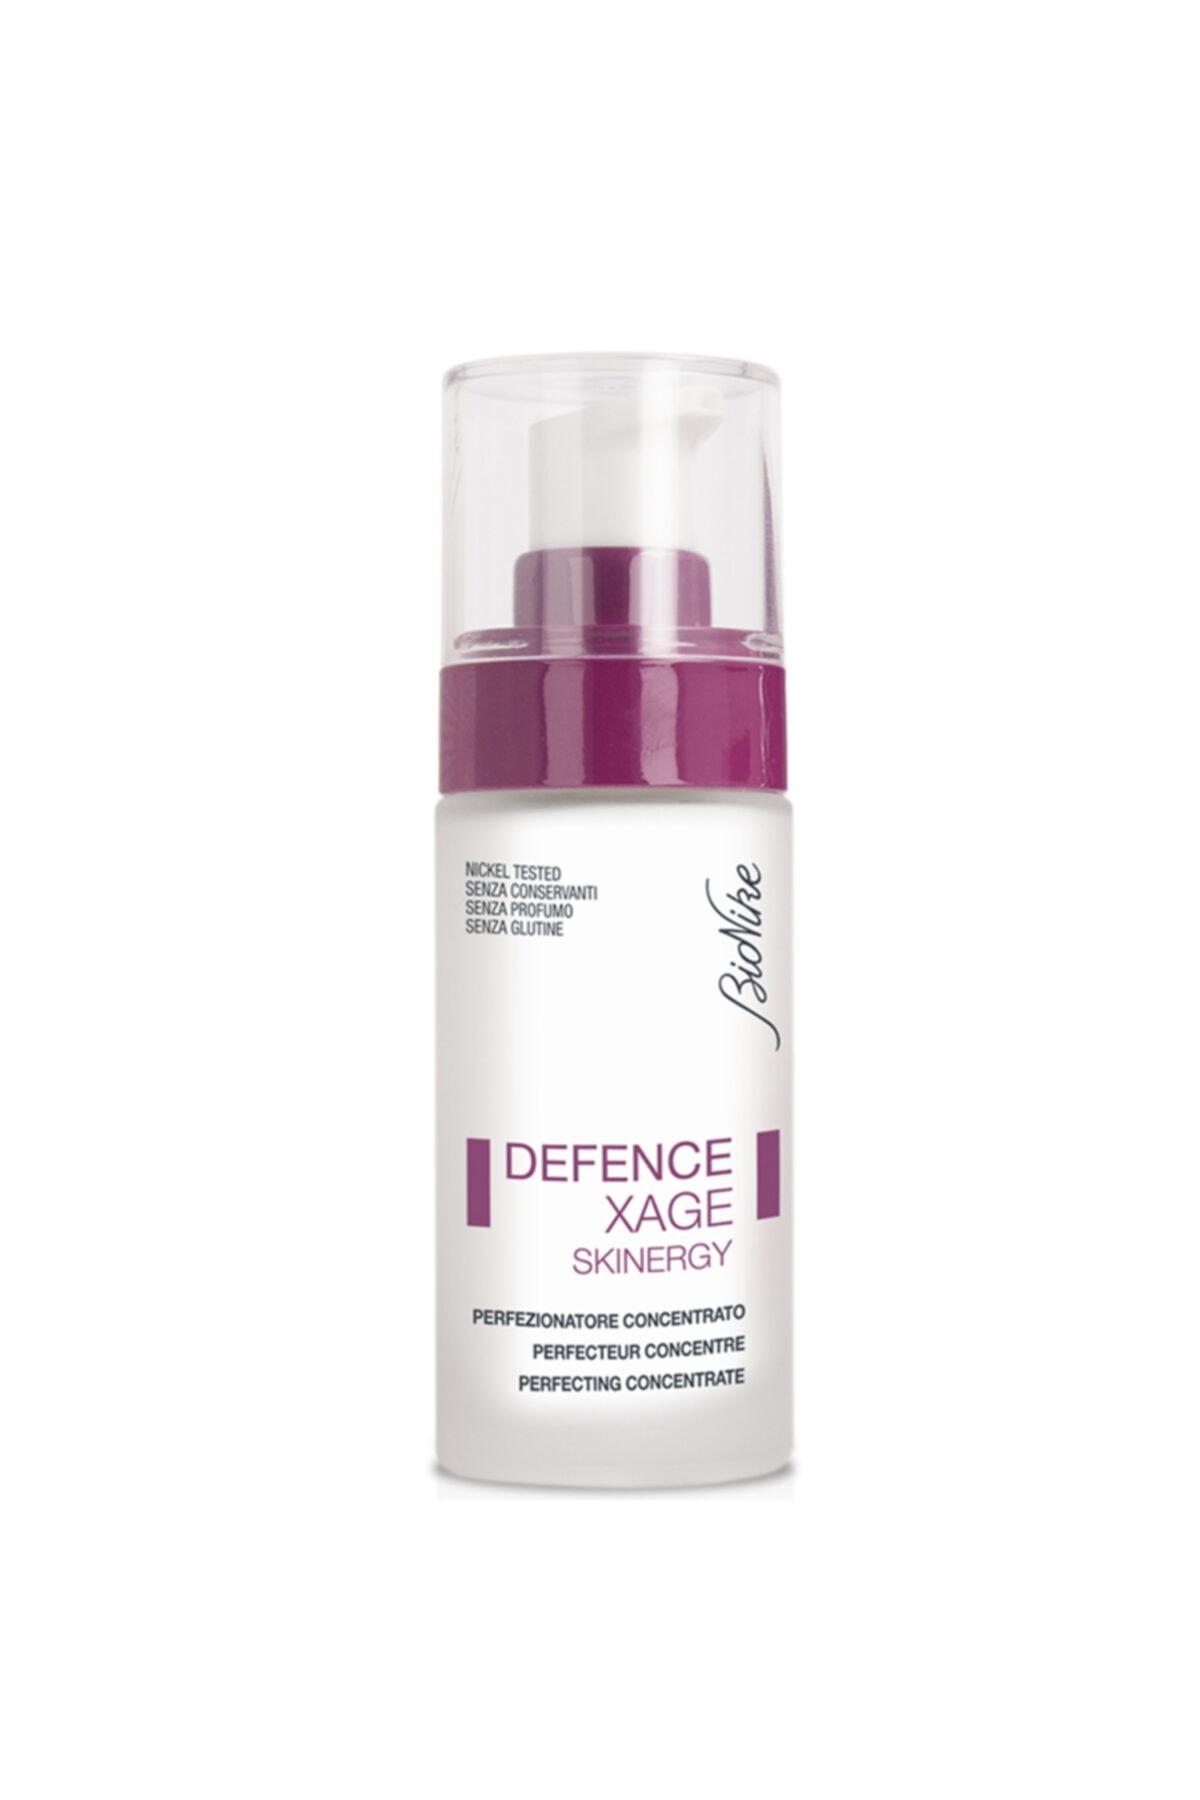 BioNike Defence Xage Skinenergy Yaşlanma Karşıtı Serum 30ml 1